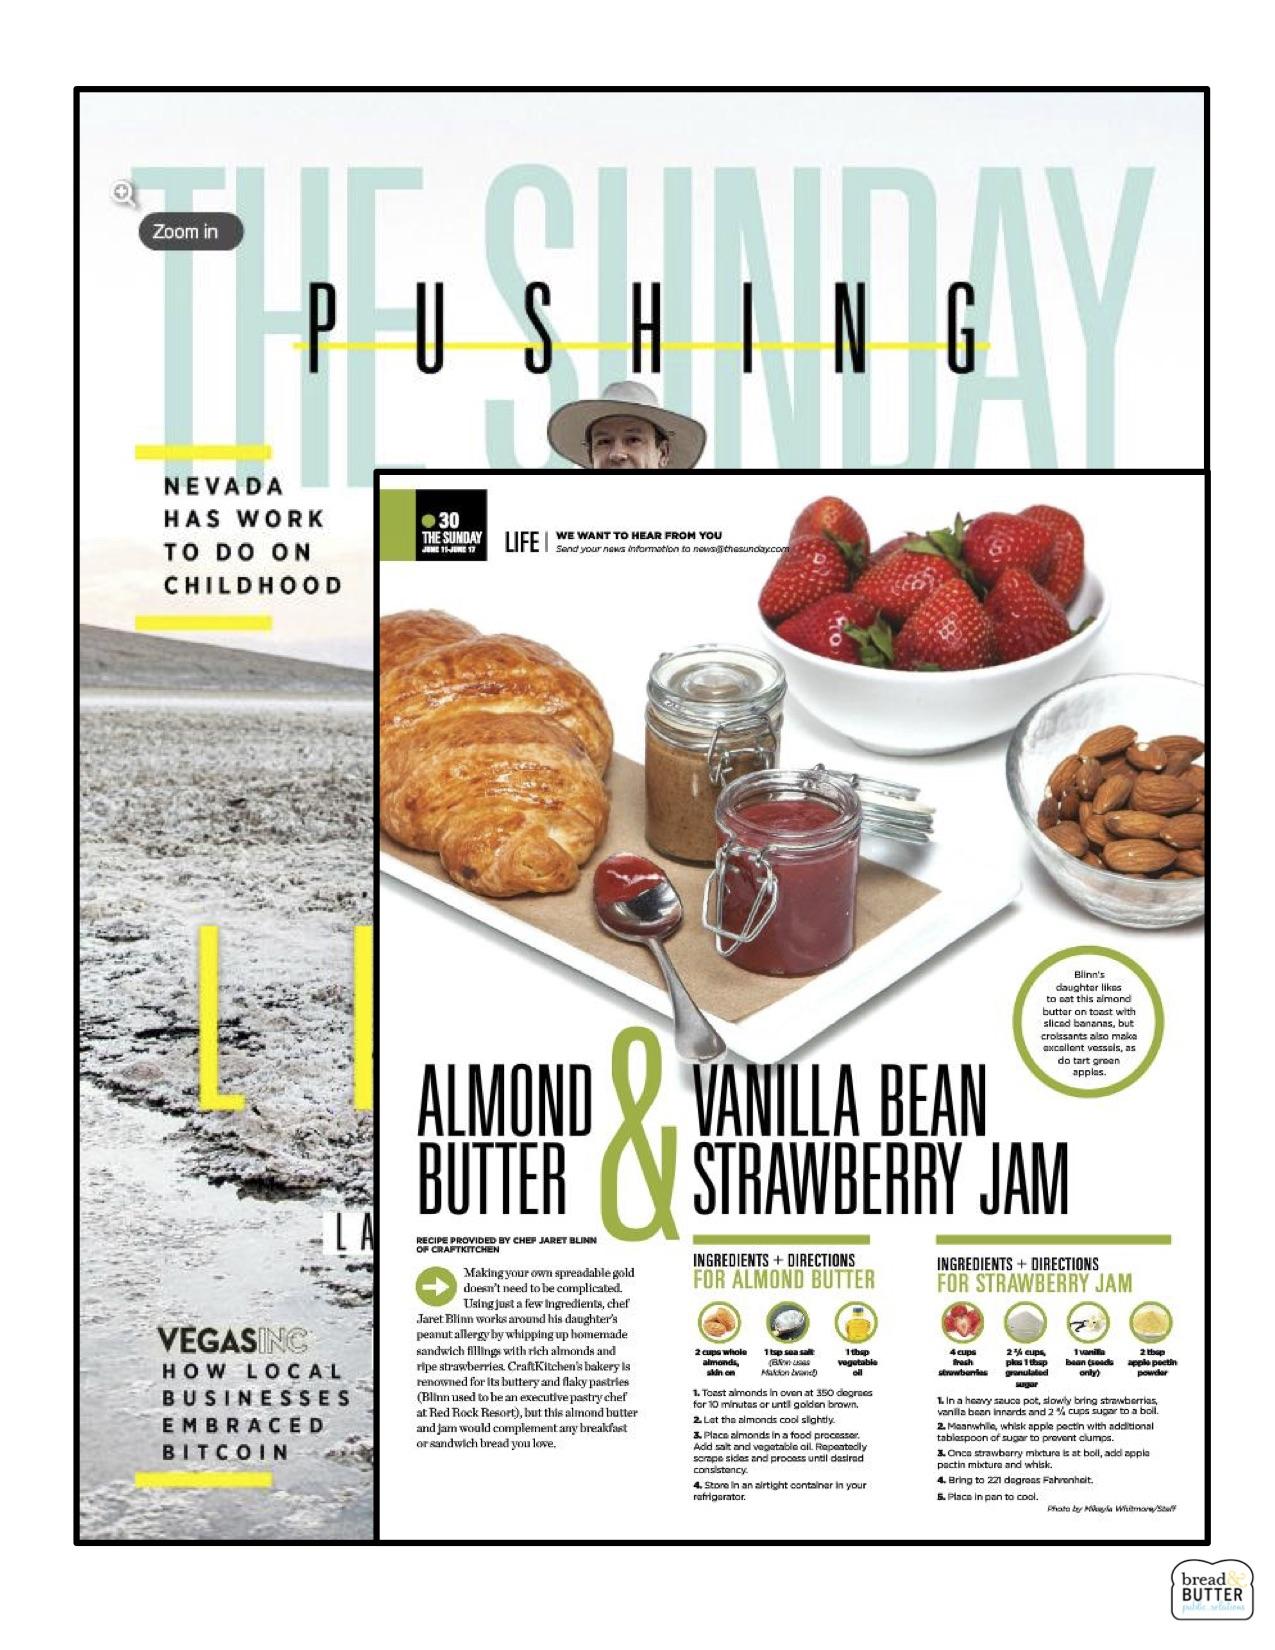 Almond Butter & Vanilla Bean Strawberry Jam